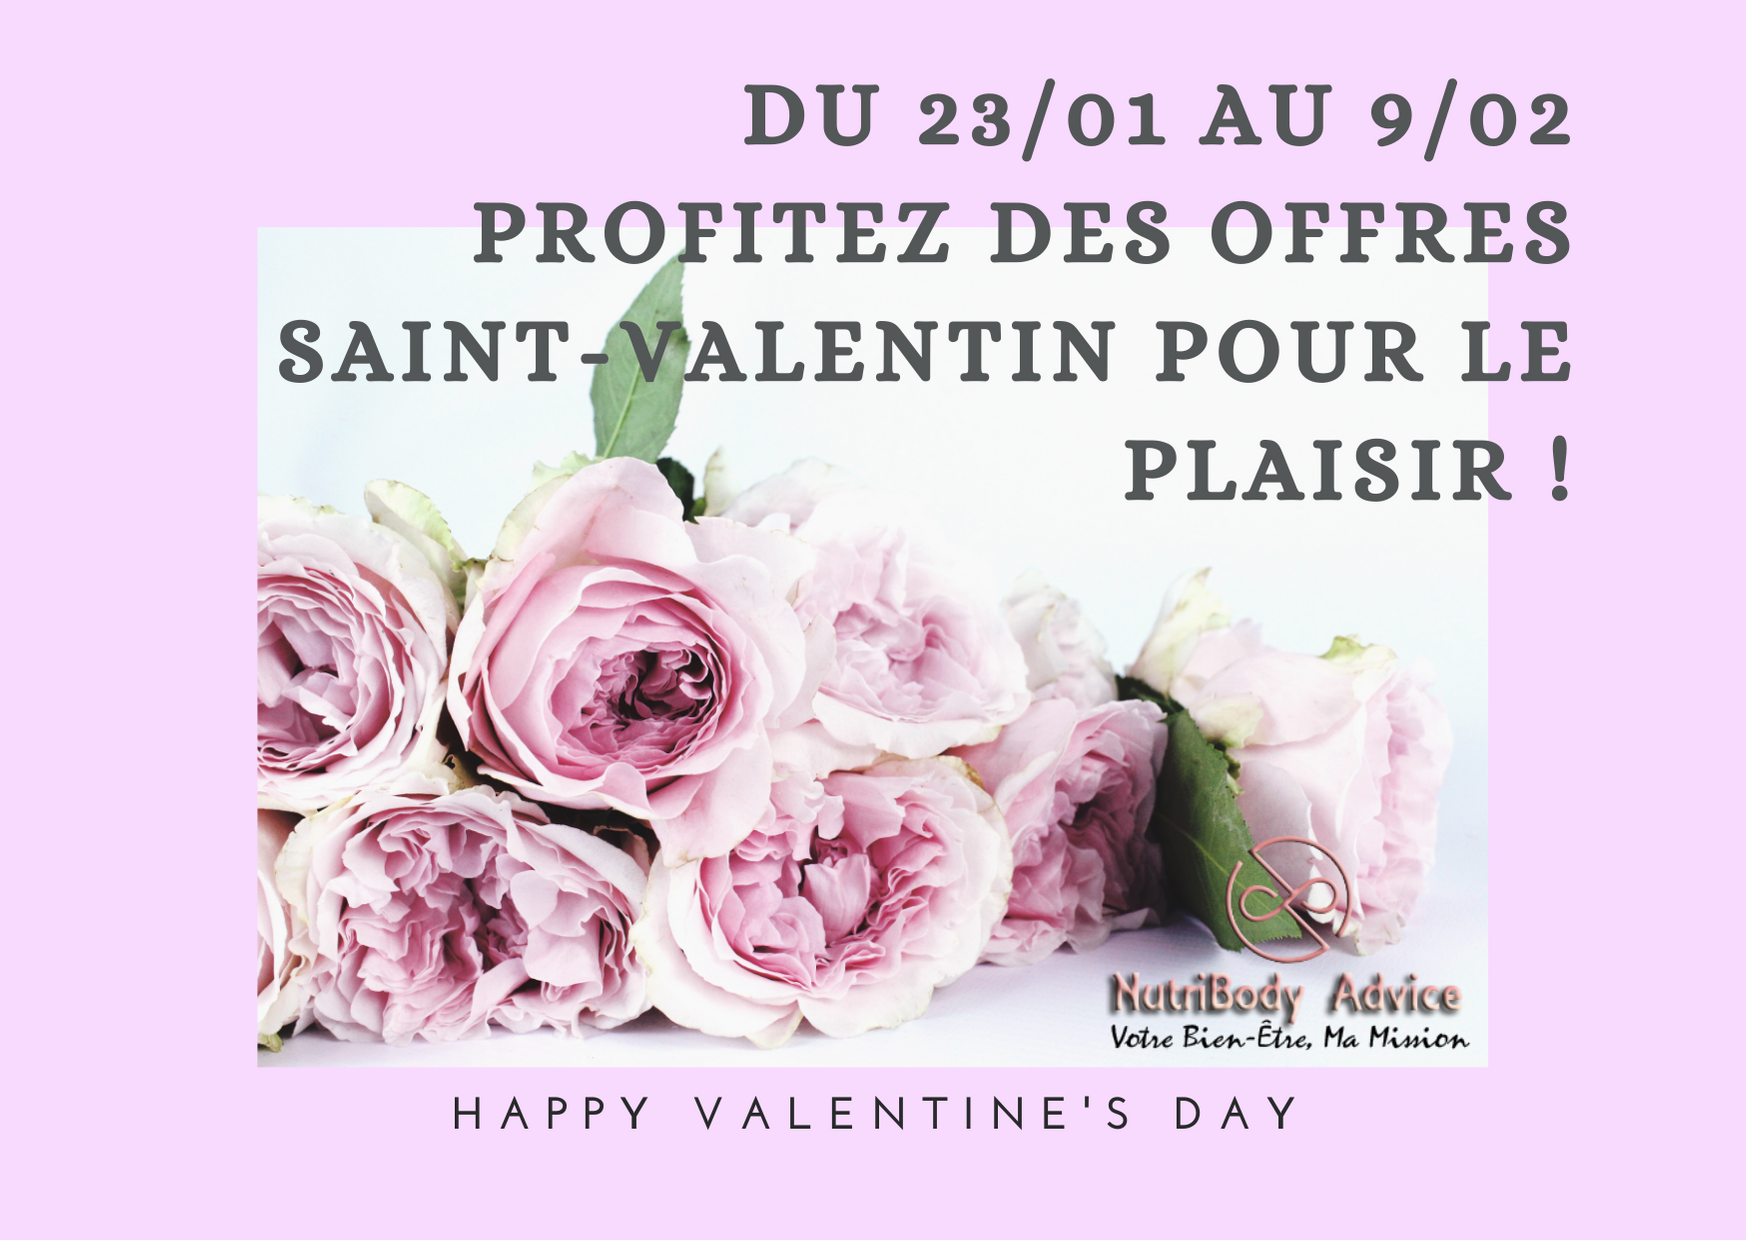 OFFRES Saint-Valentin